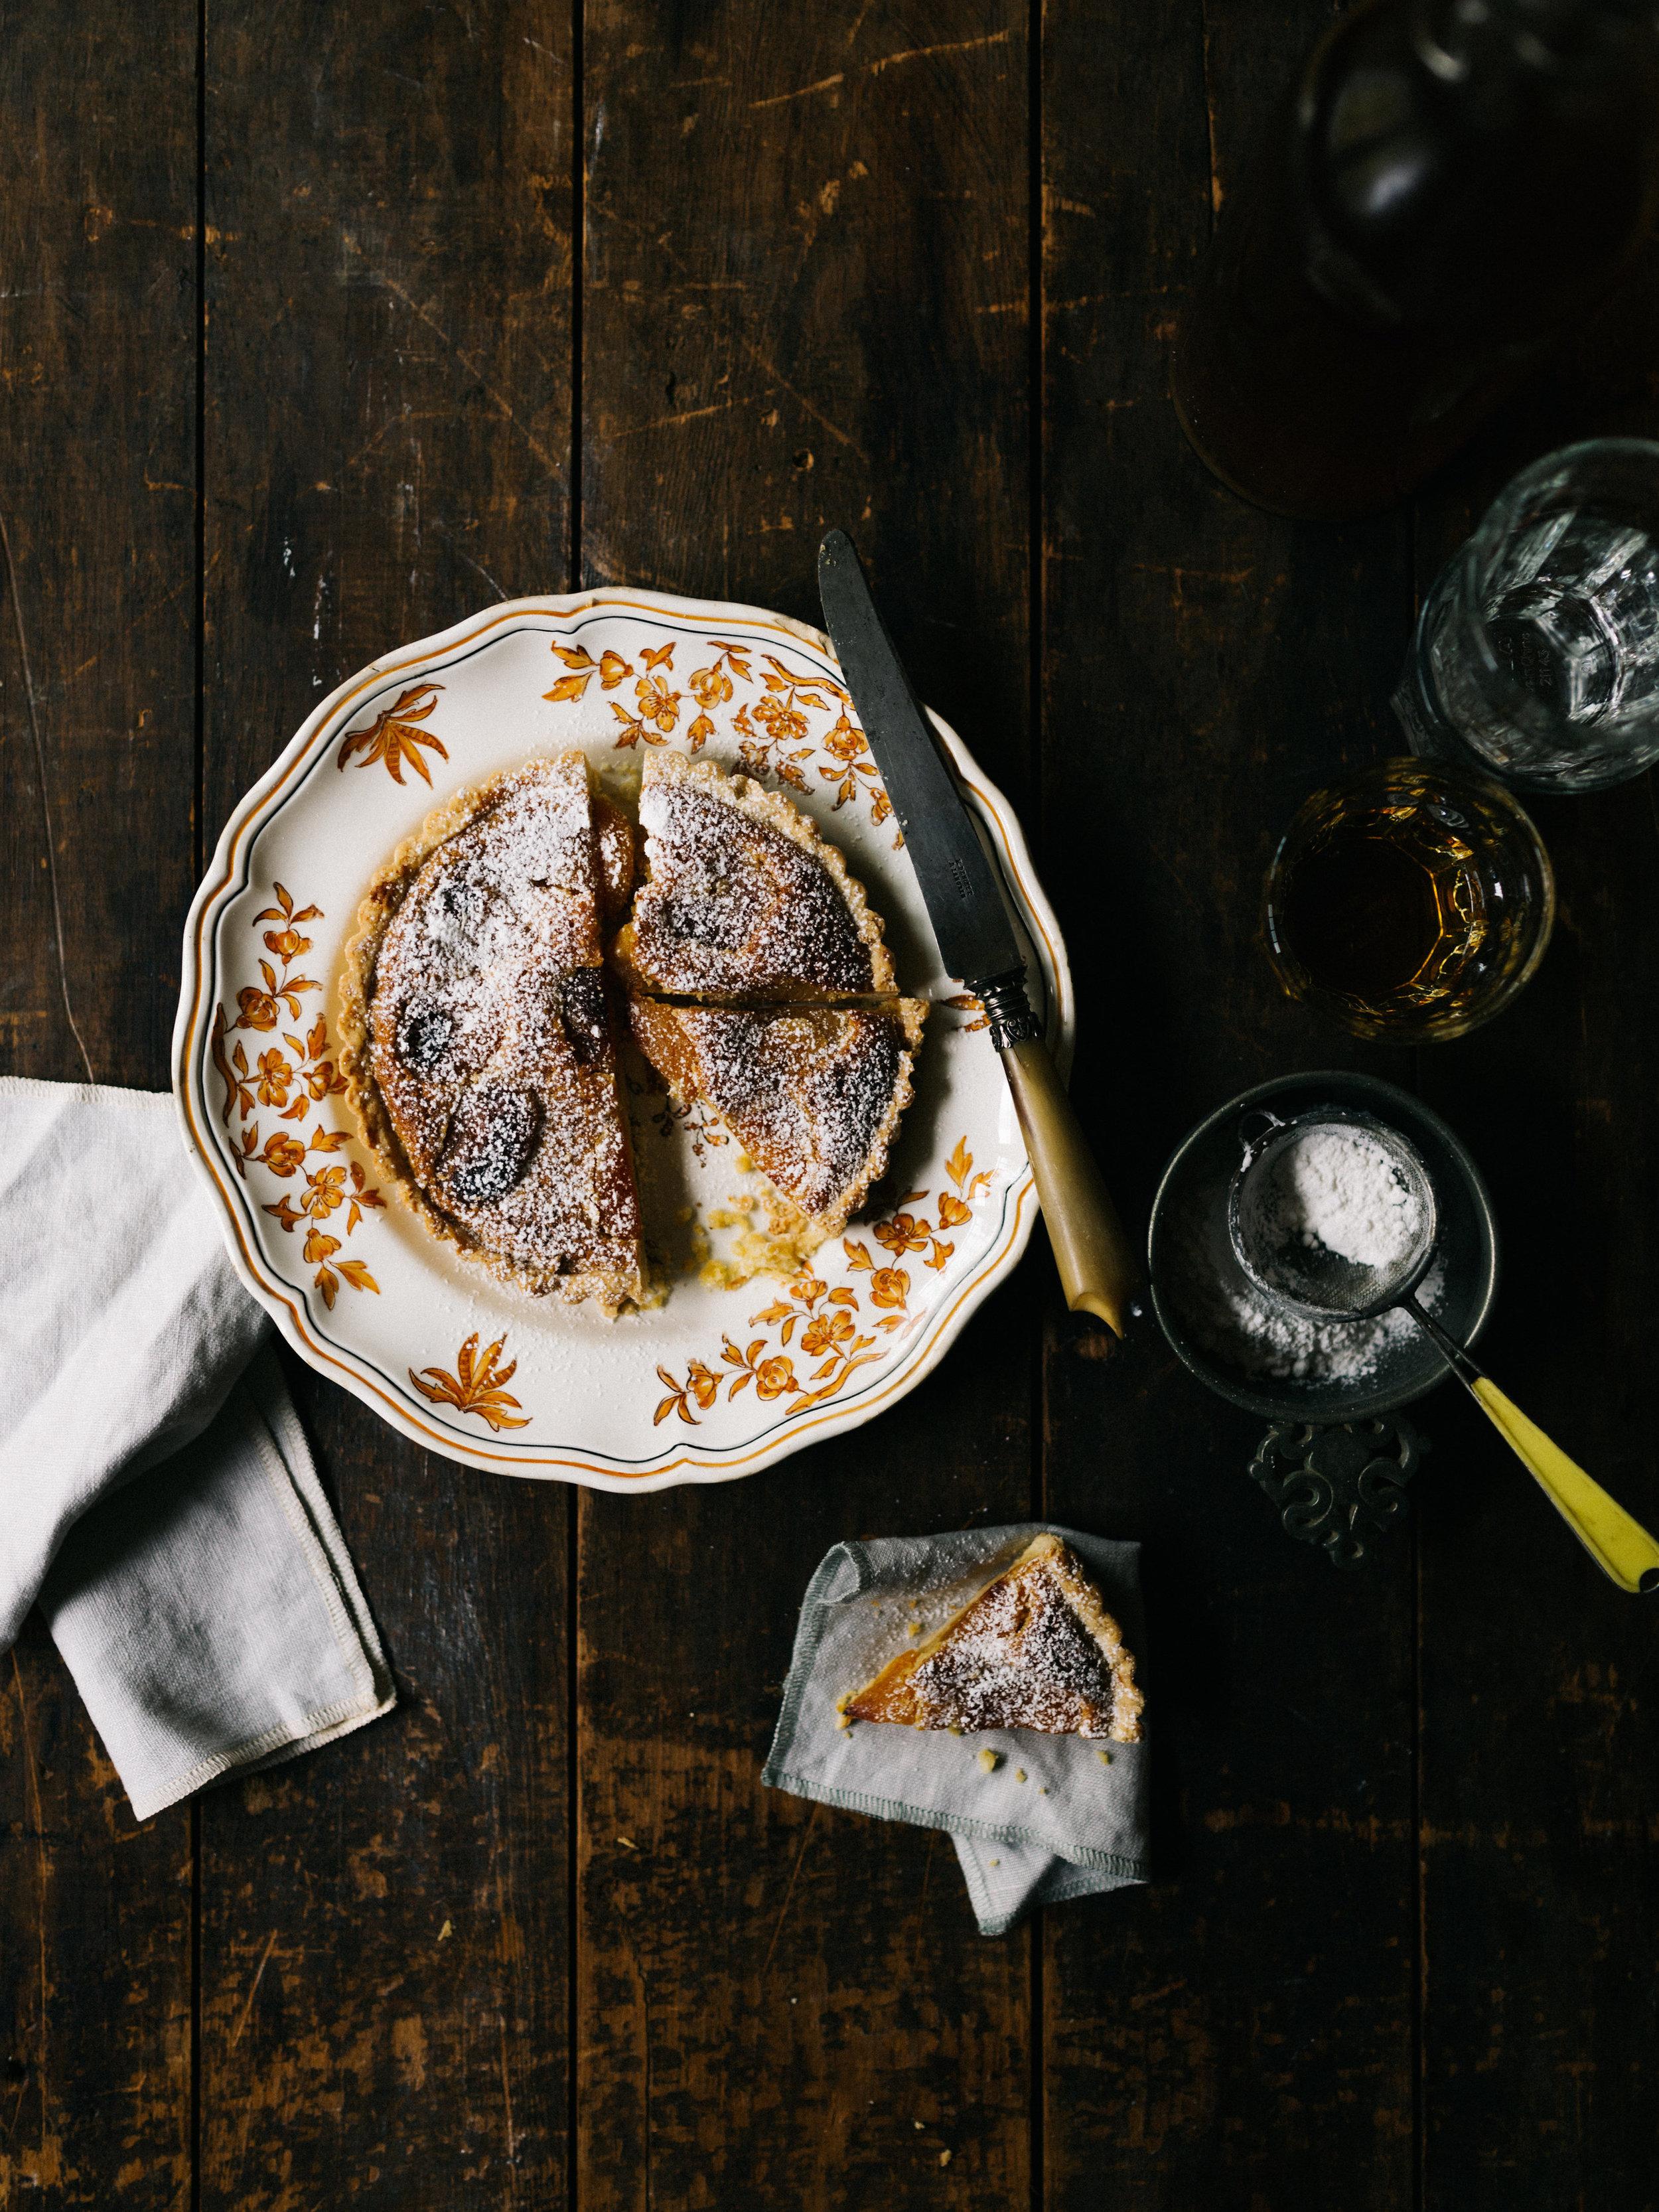 catrine-kelty-gabriella-uncommon-feasts-linen-napkin-fall-almond-tart-recipe-boston-everyday-co